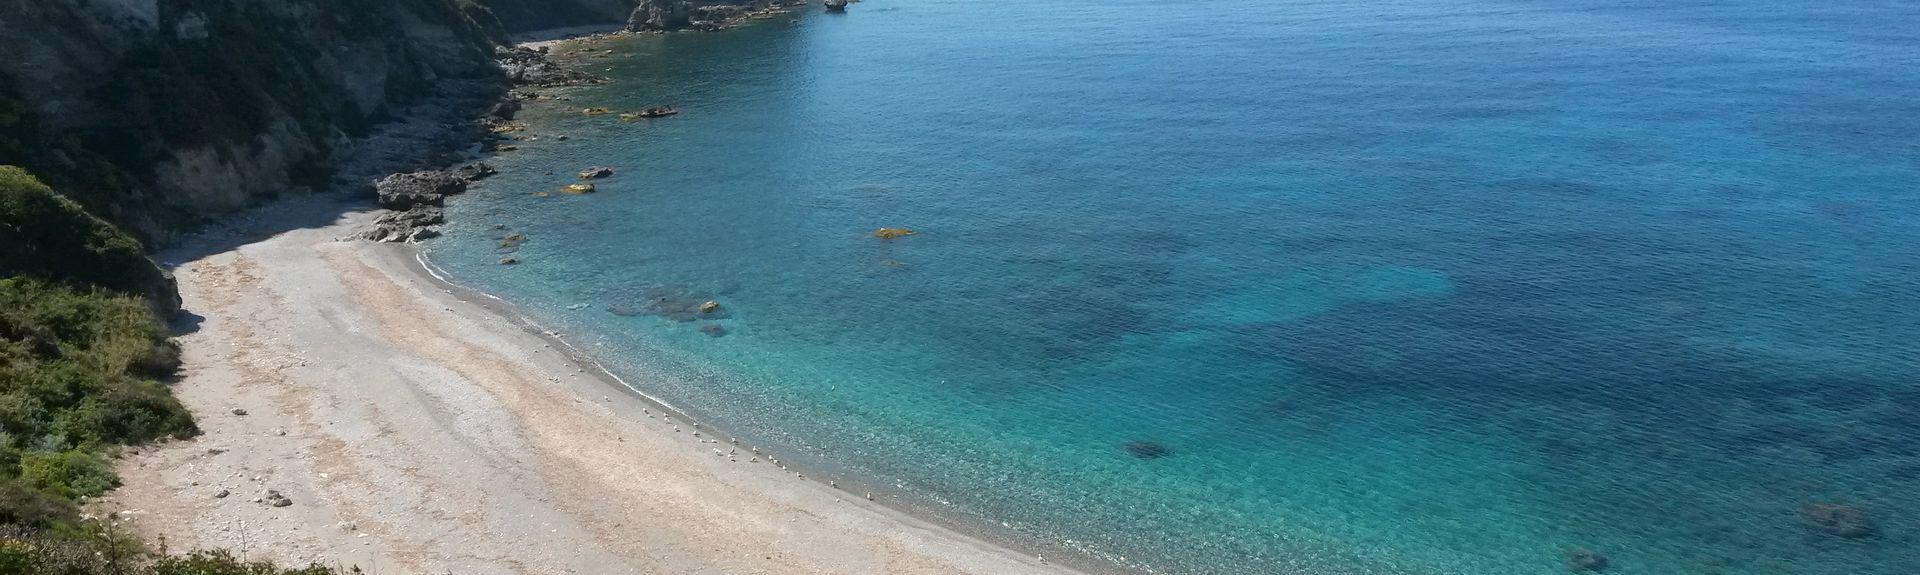 Milazzo, Sicilië, Italië